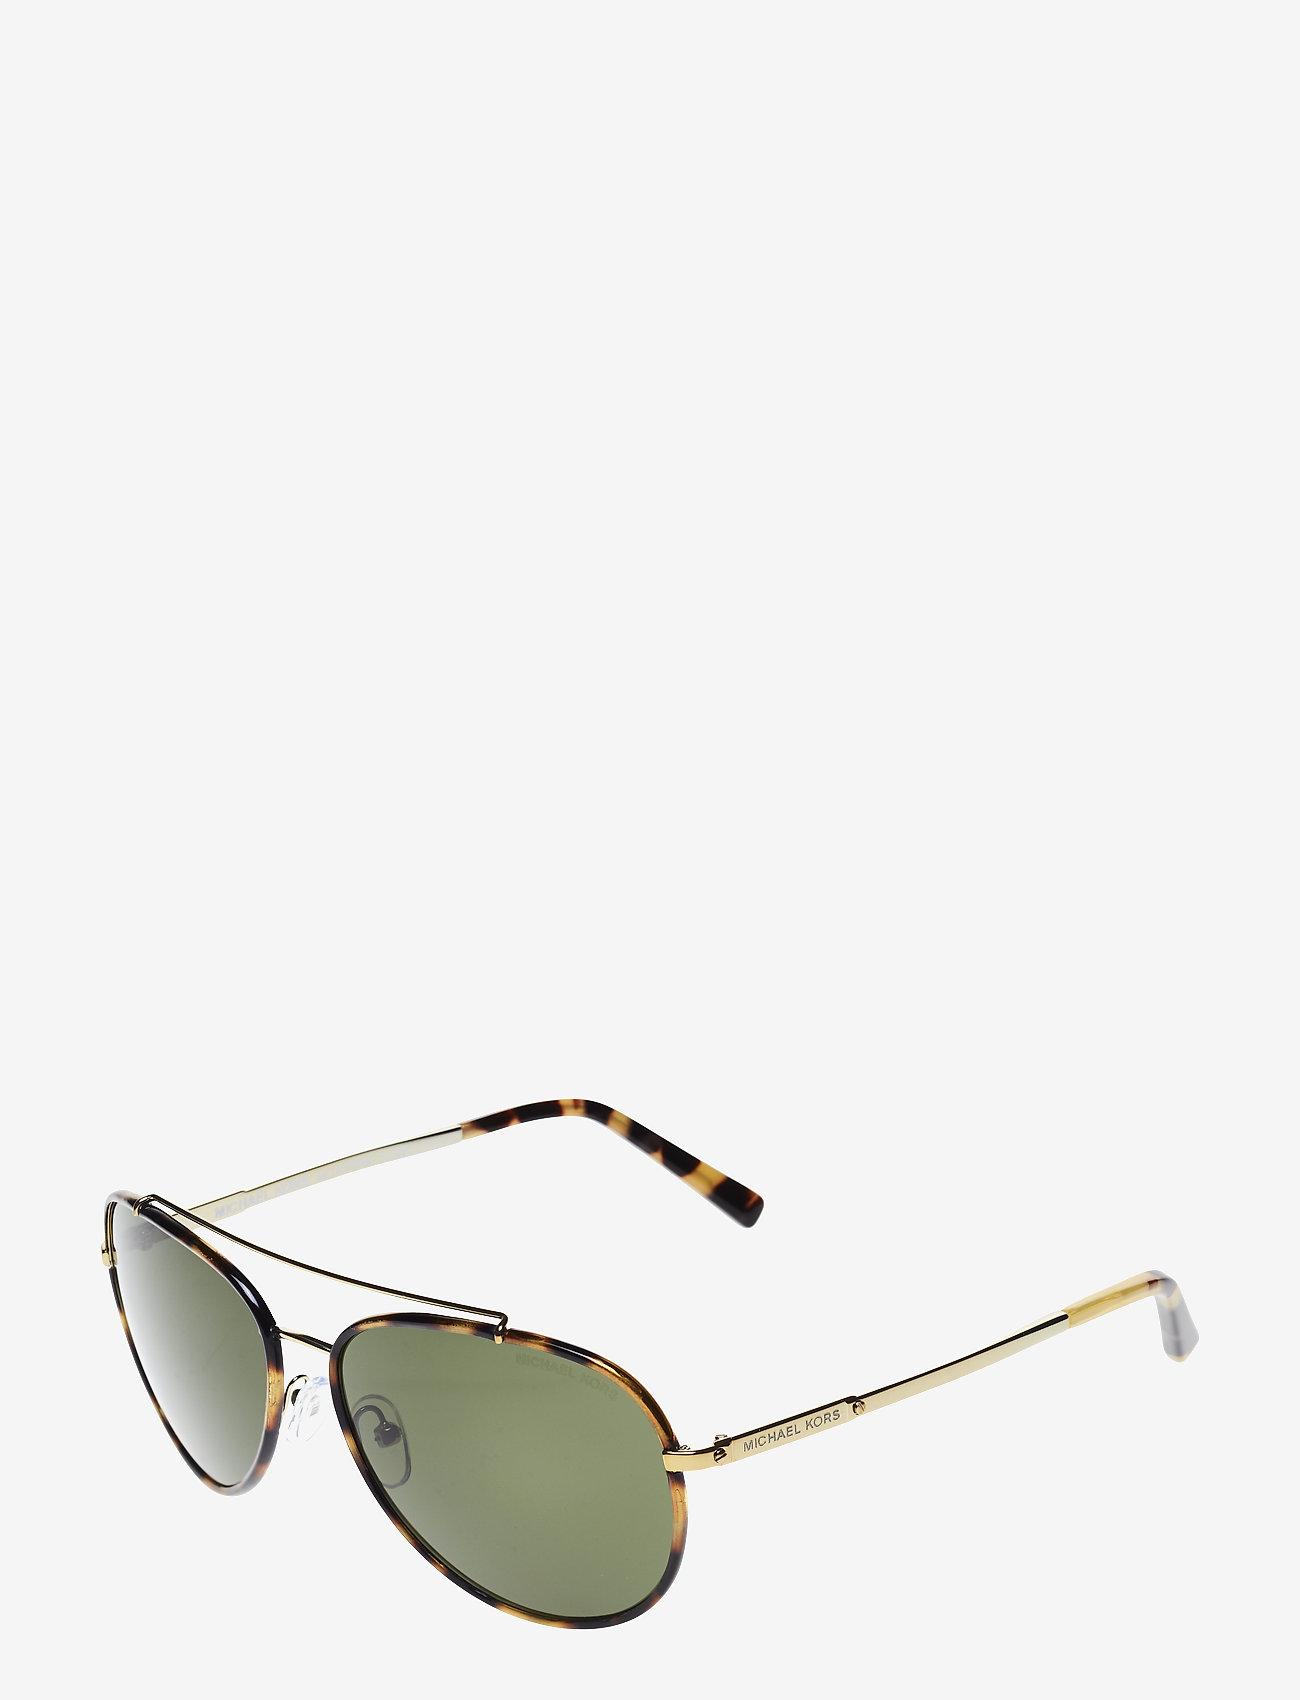 Michael Kors Sunglasses - Aviator - pilot - tokyo tortoise/gold-tone - 1